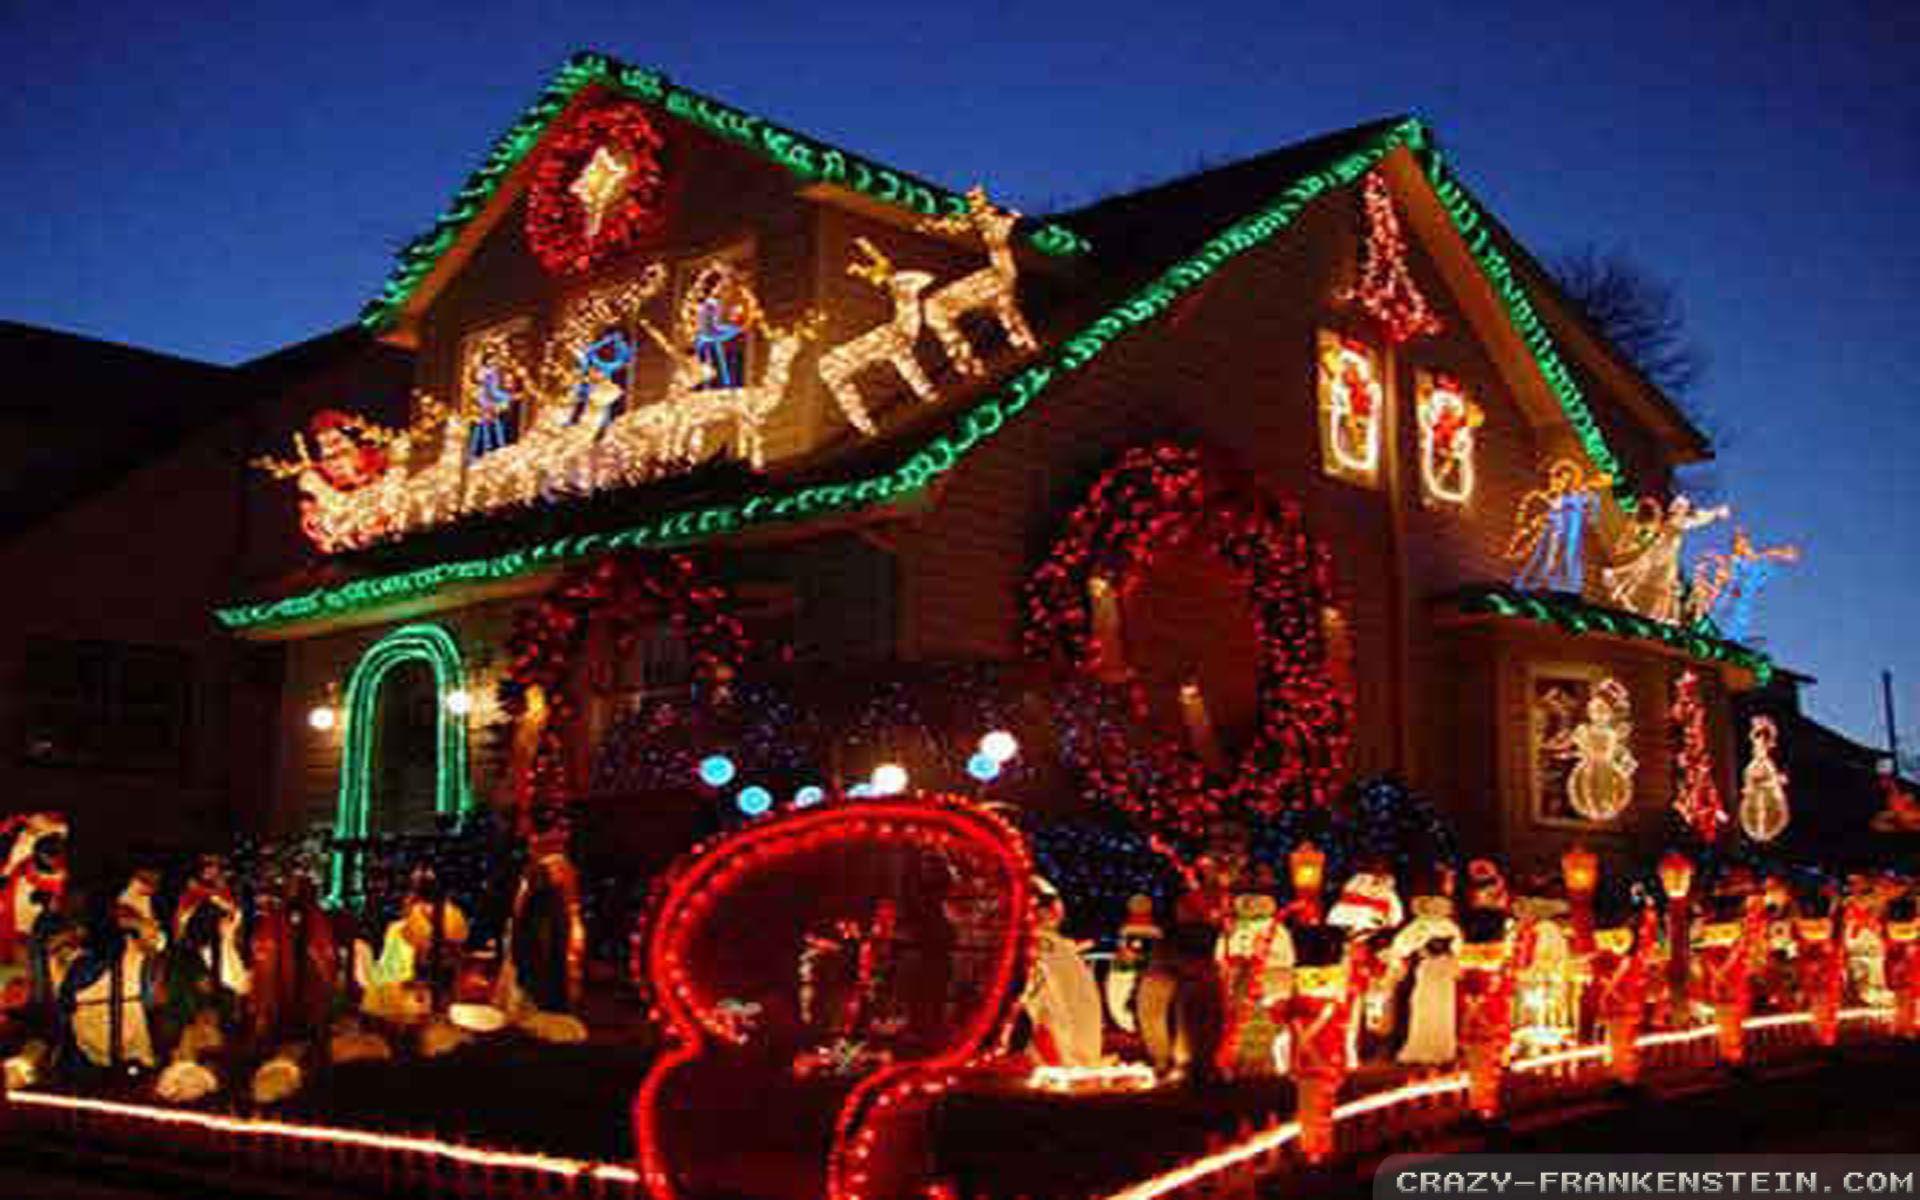 Outdoor christmas tree decorations 9 is creative inspiration for us description from christmastreedecoratingidea com